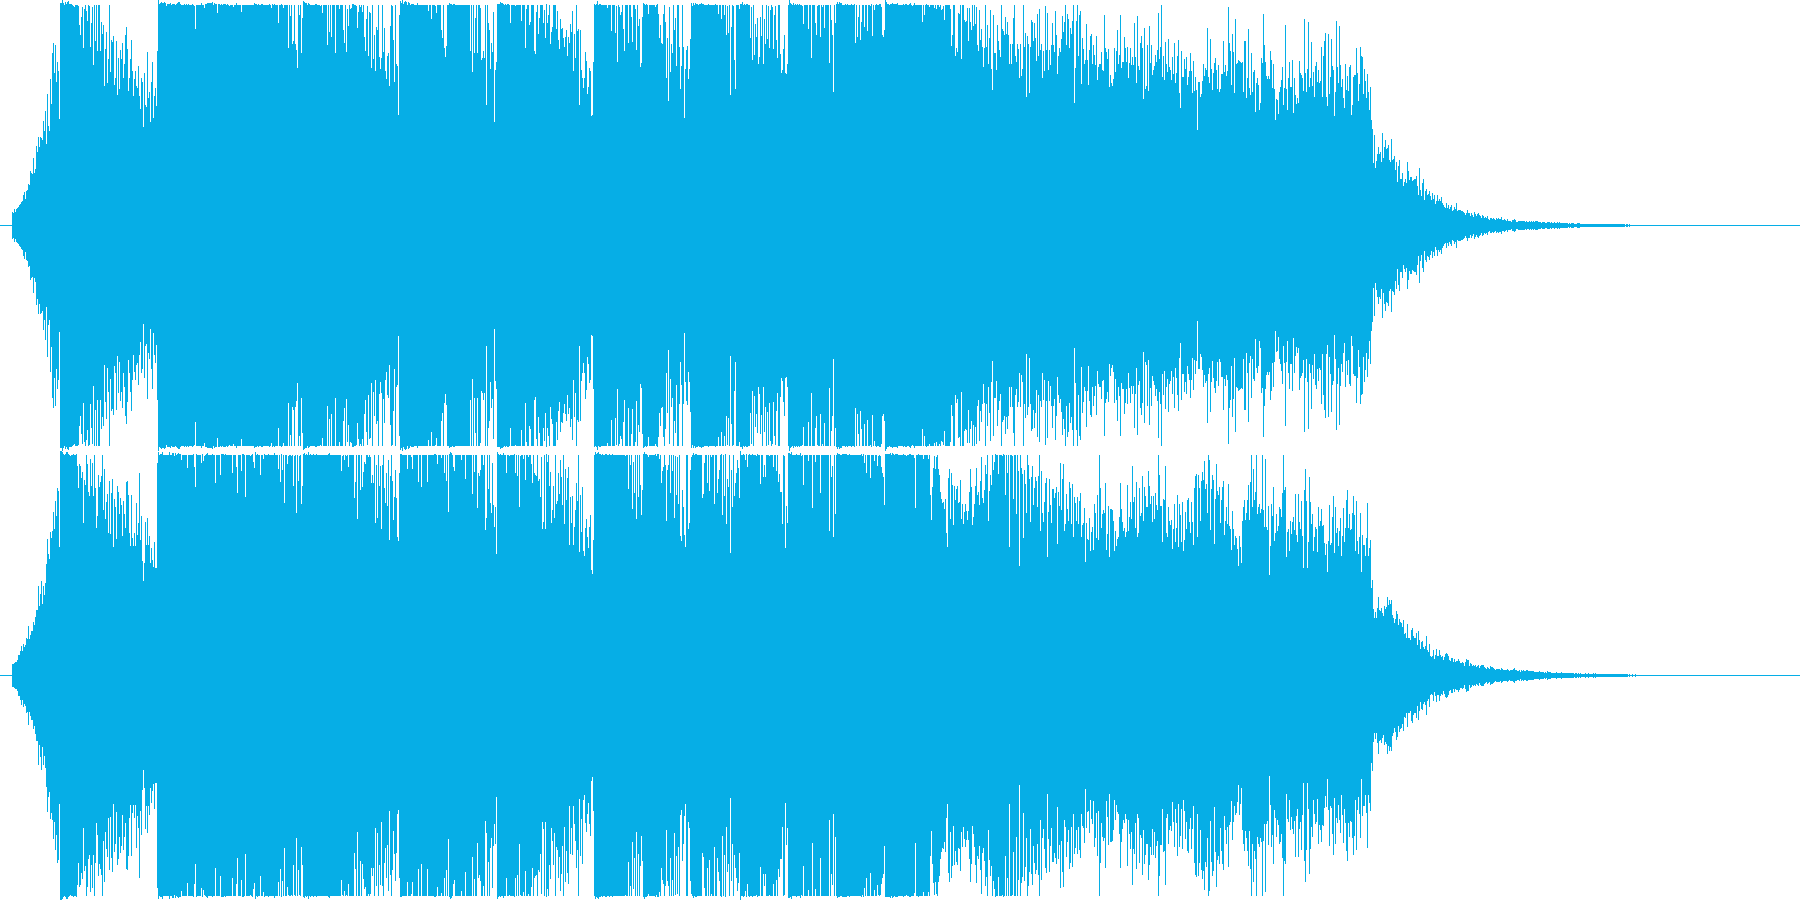 Refreshing EDM jingle / CM's reproduced waveform